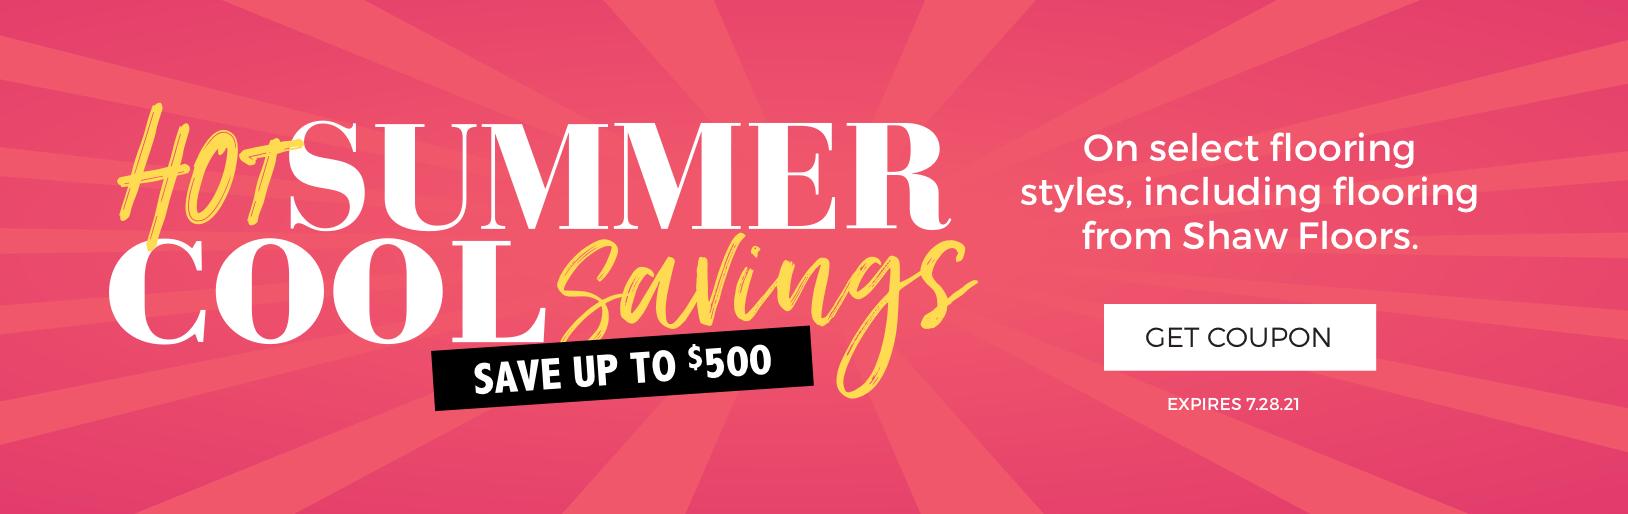 Hot Summer, Cool Savings sale